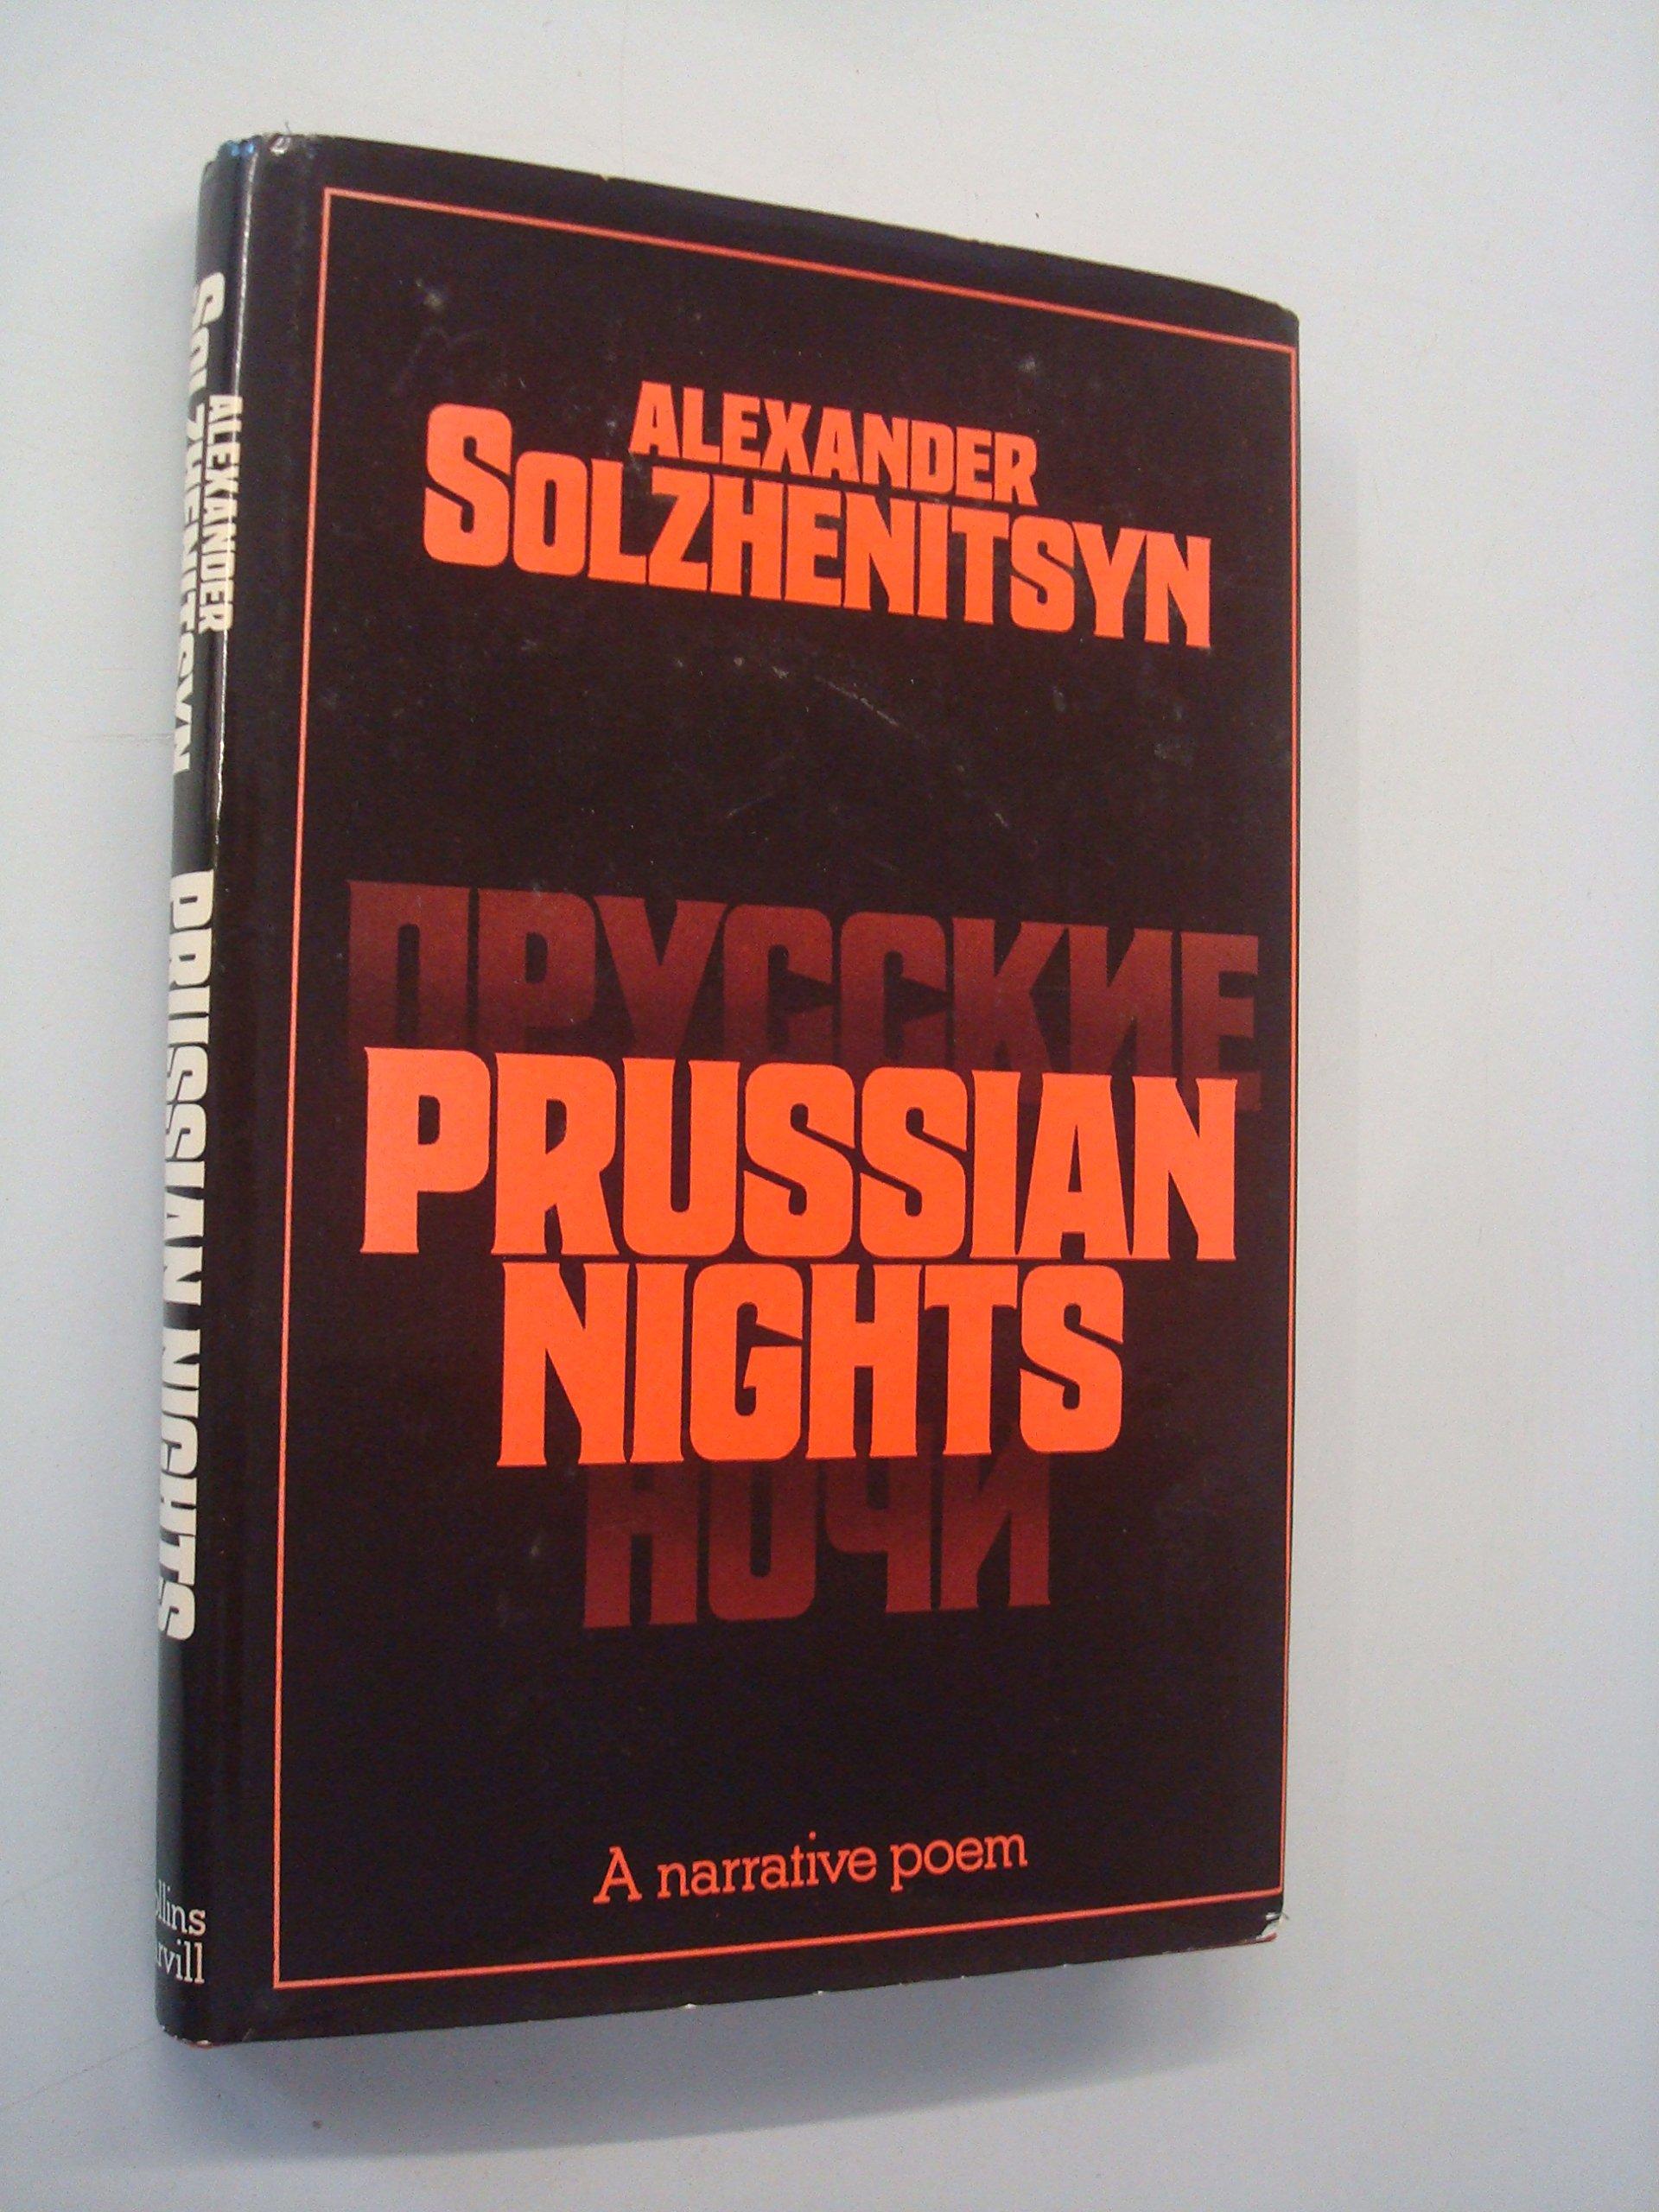 Prussian Nights